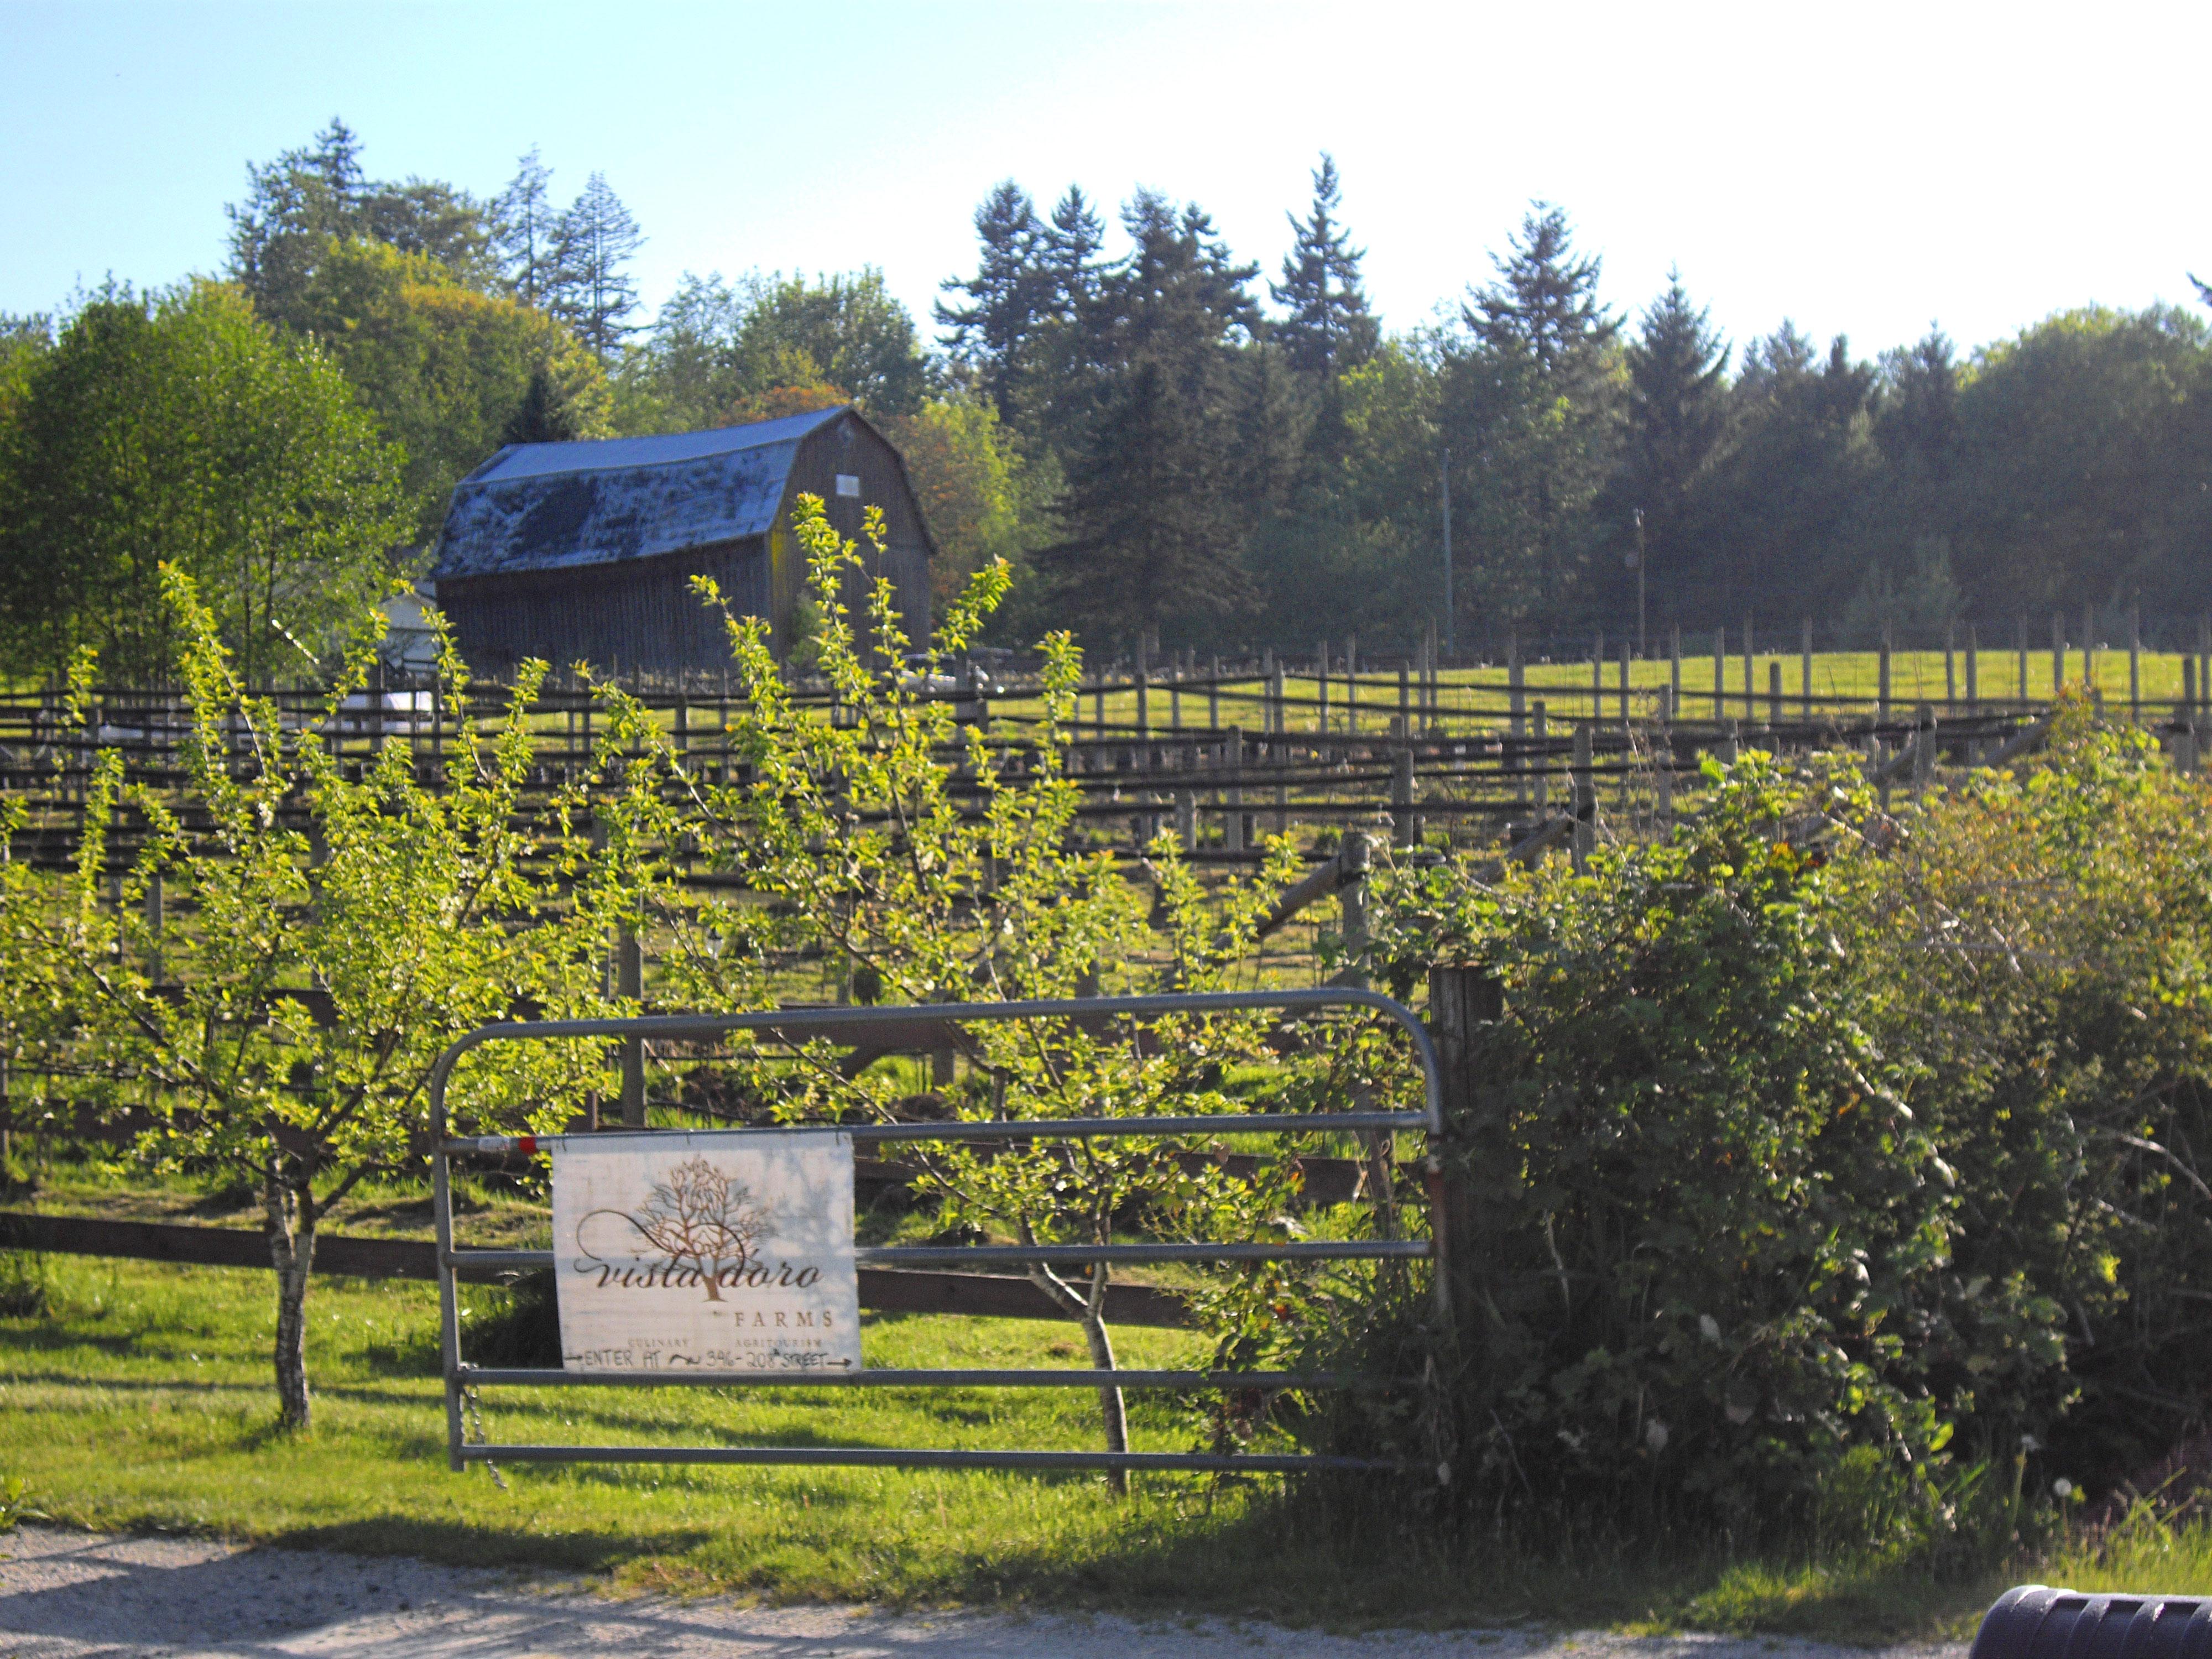 A farm in Langley